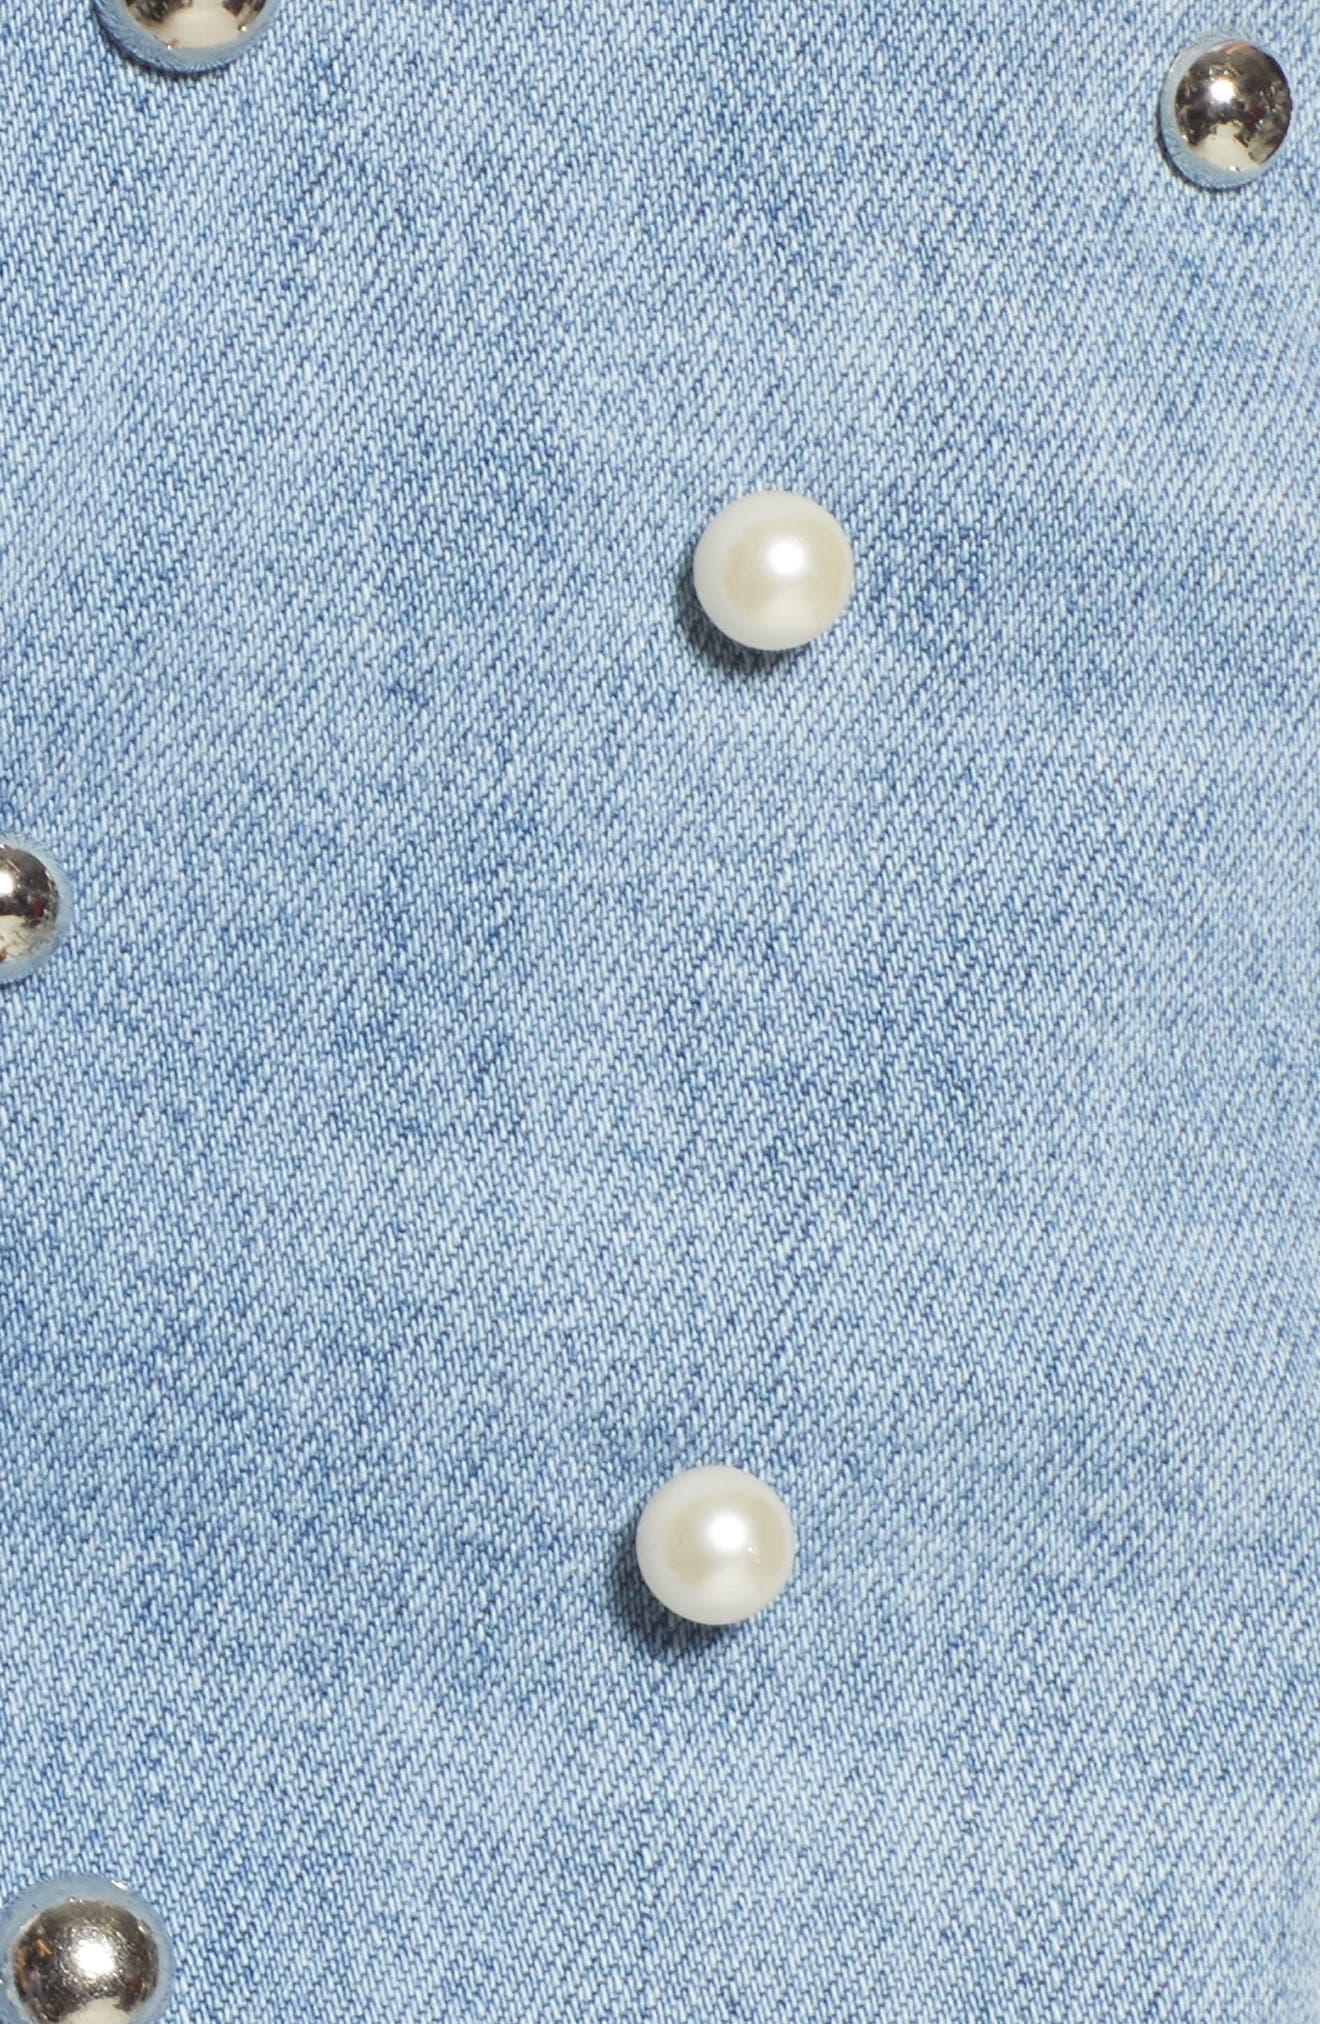 Imitation Pearl & Stud Ripped Denim Bermuda Shorts,                             Alternate thumbnail 3, color,                             Vintage Malibu